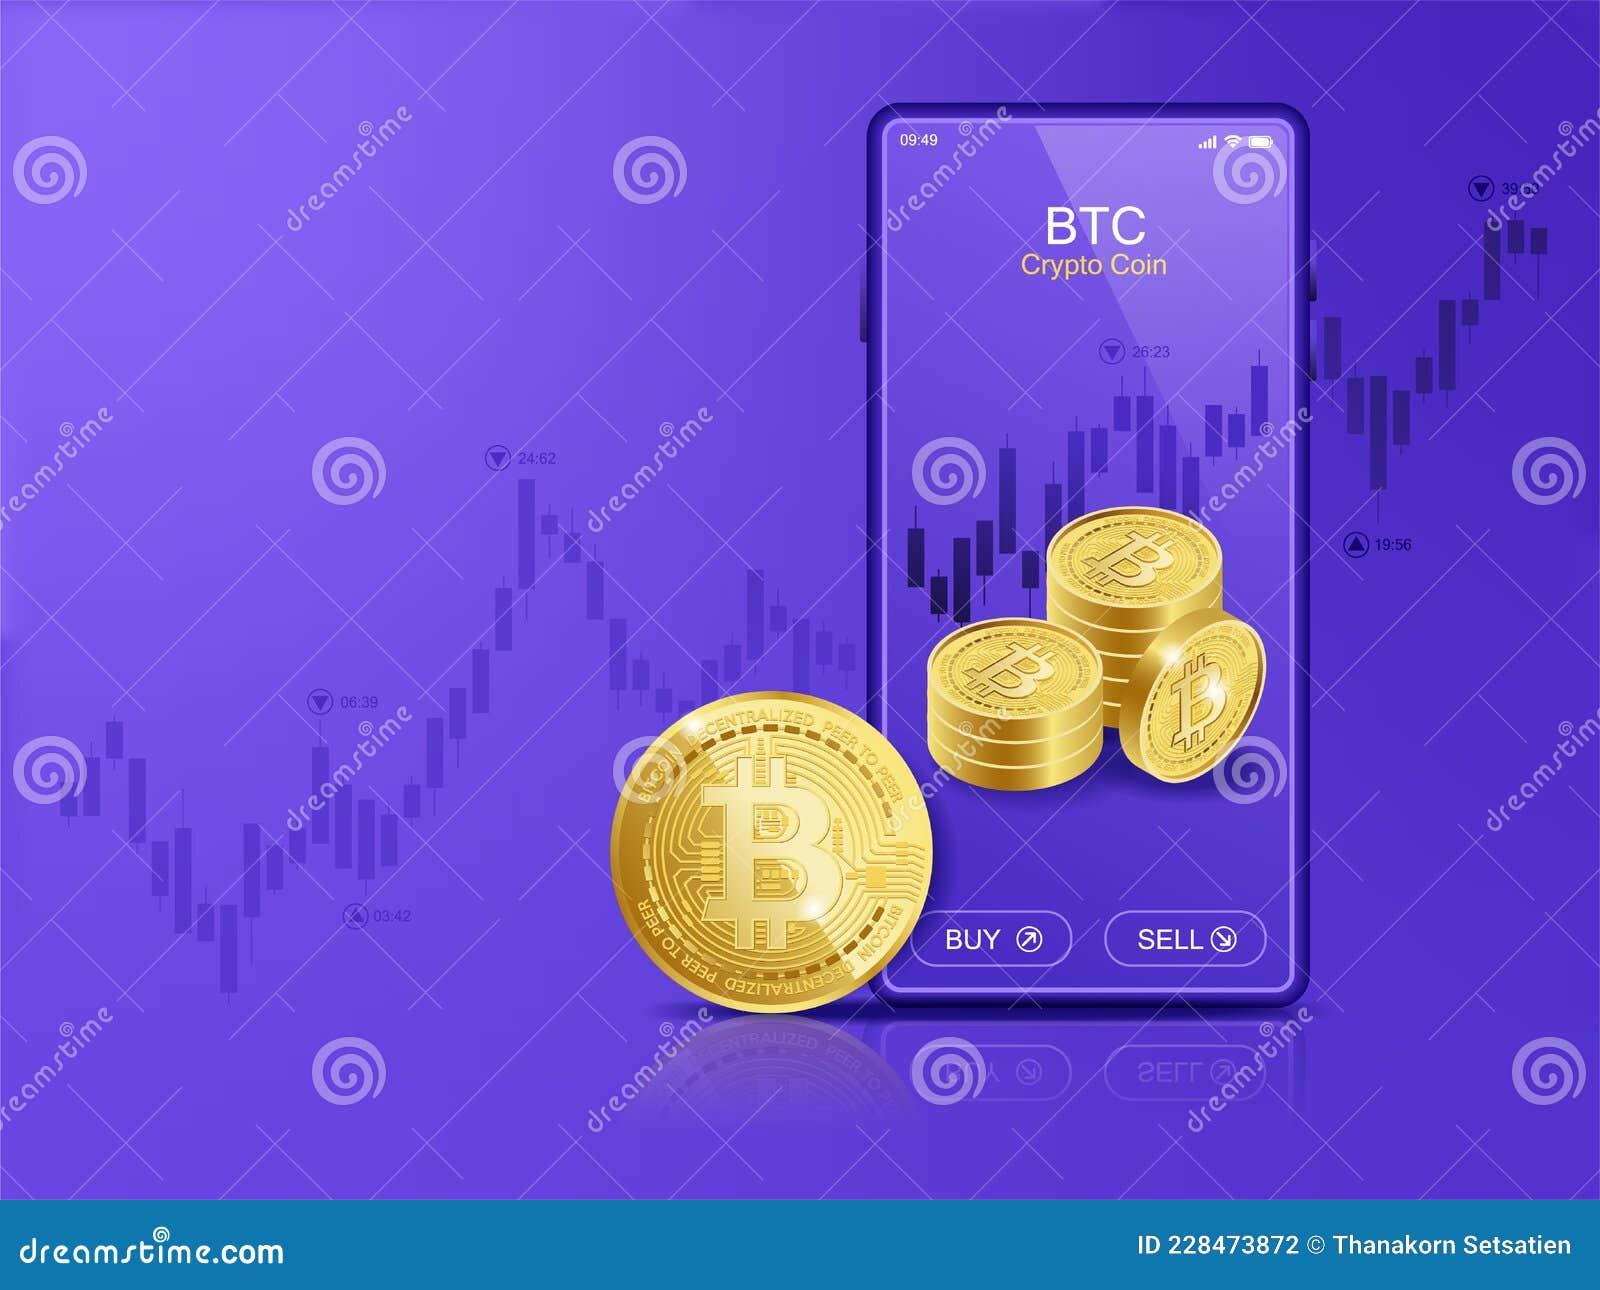 btrade bitcoin trading system